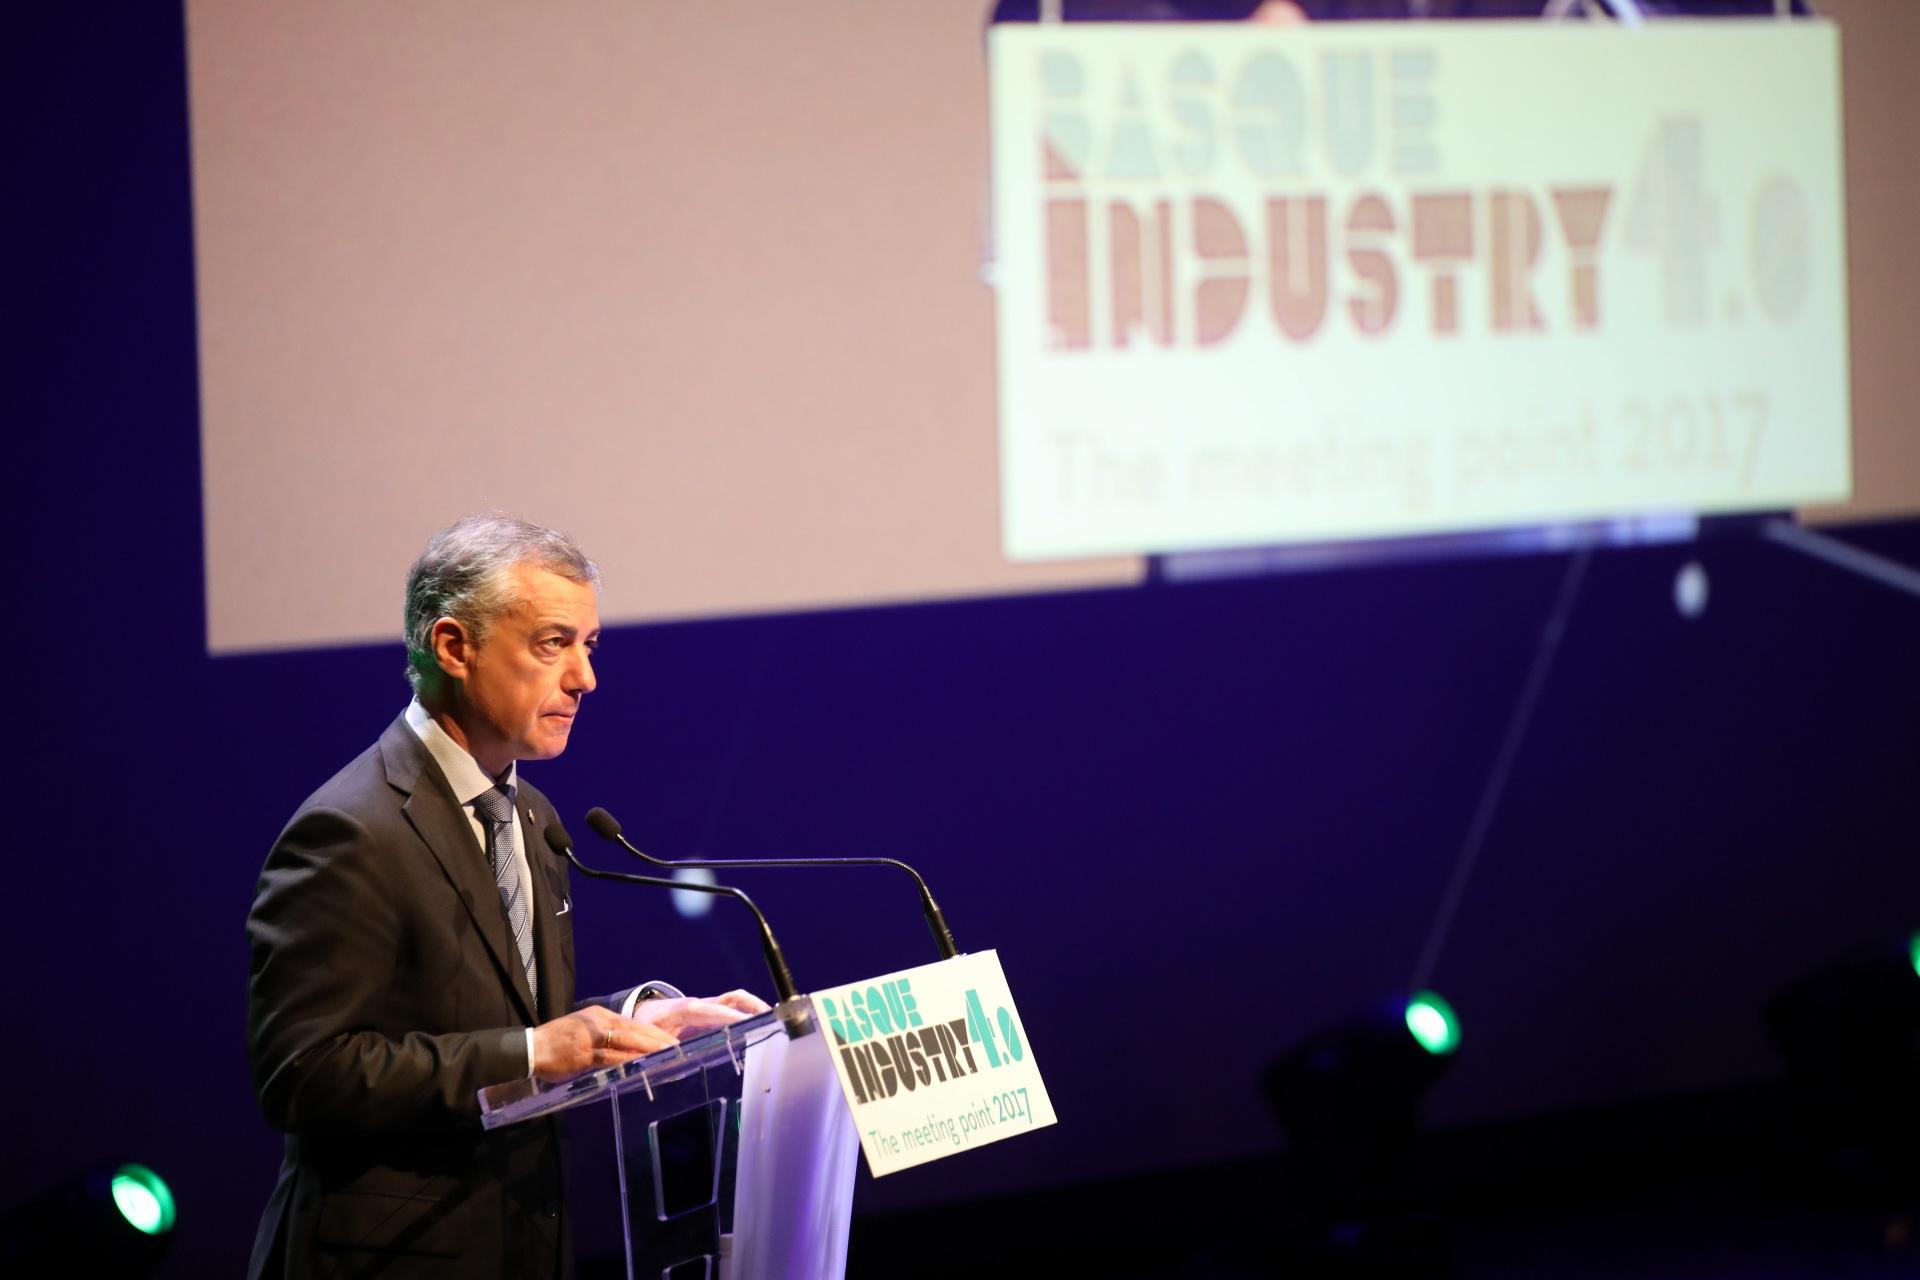 Lehendakari_en_BasqueIndustry.JPG